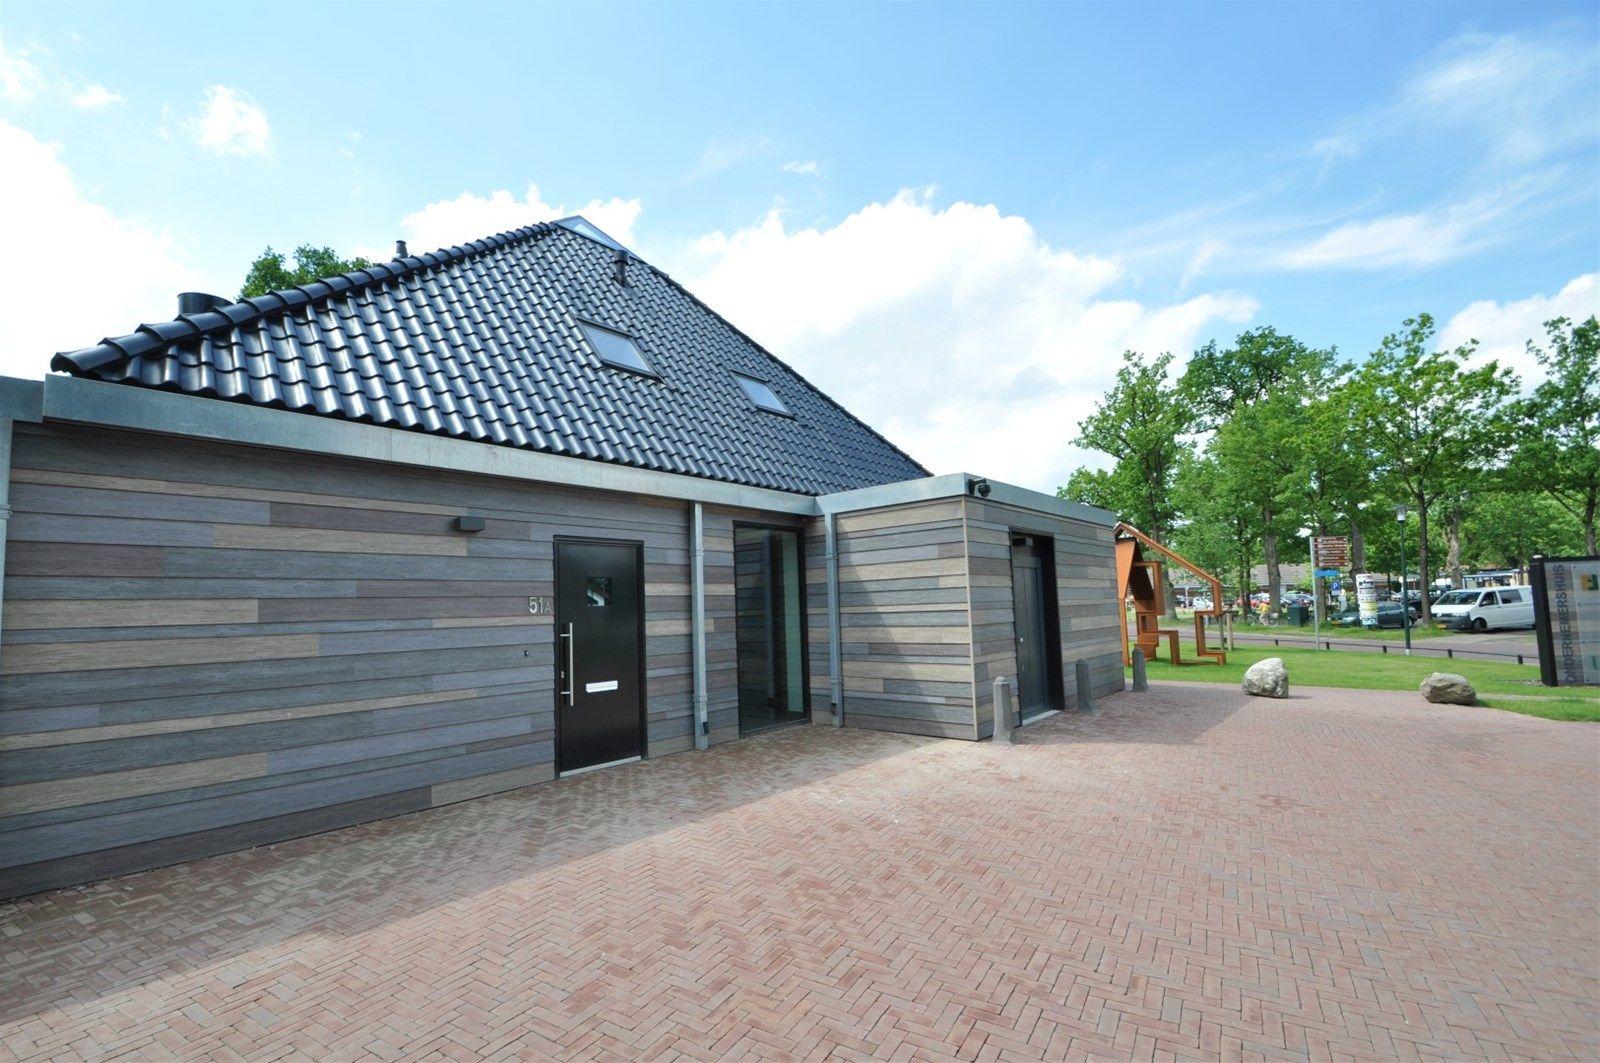 Dorpsstraat, Havelte